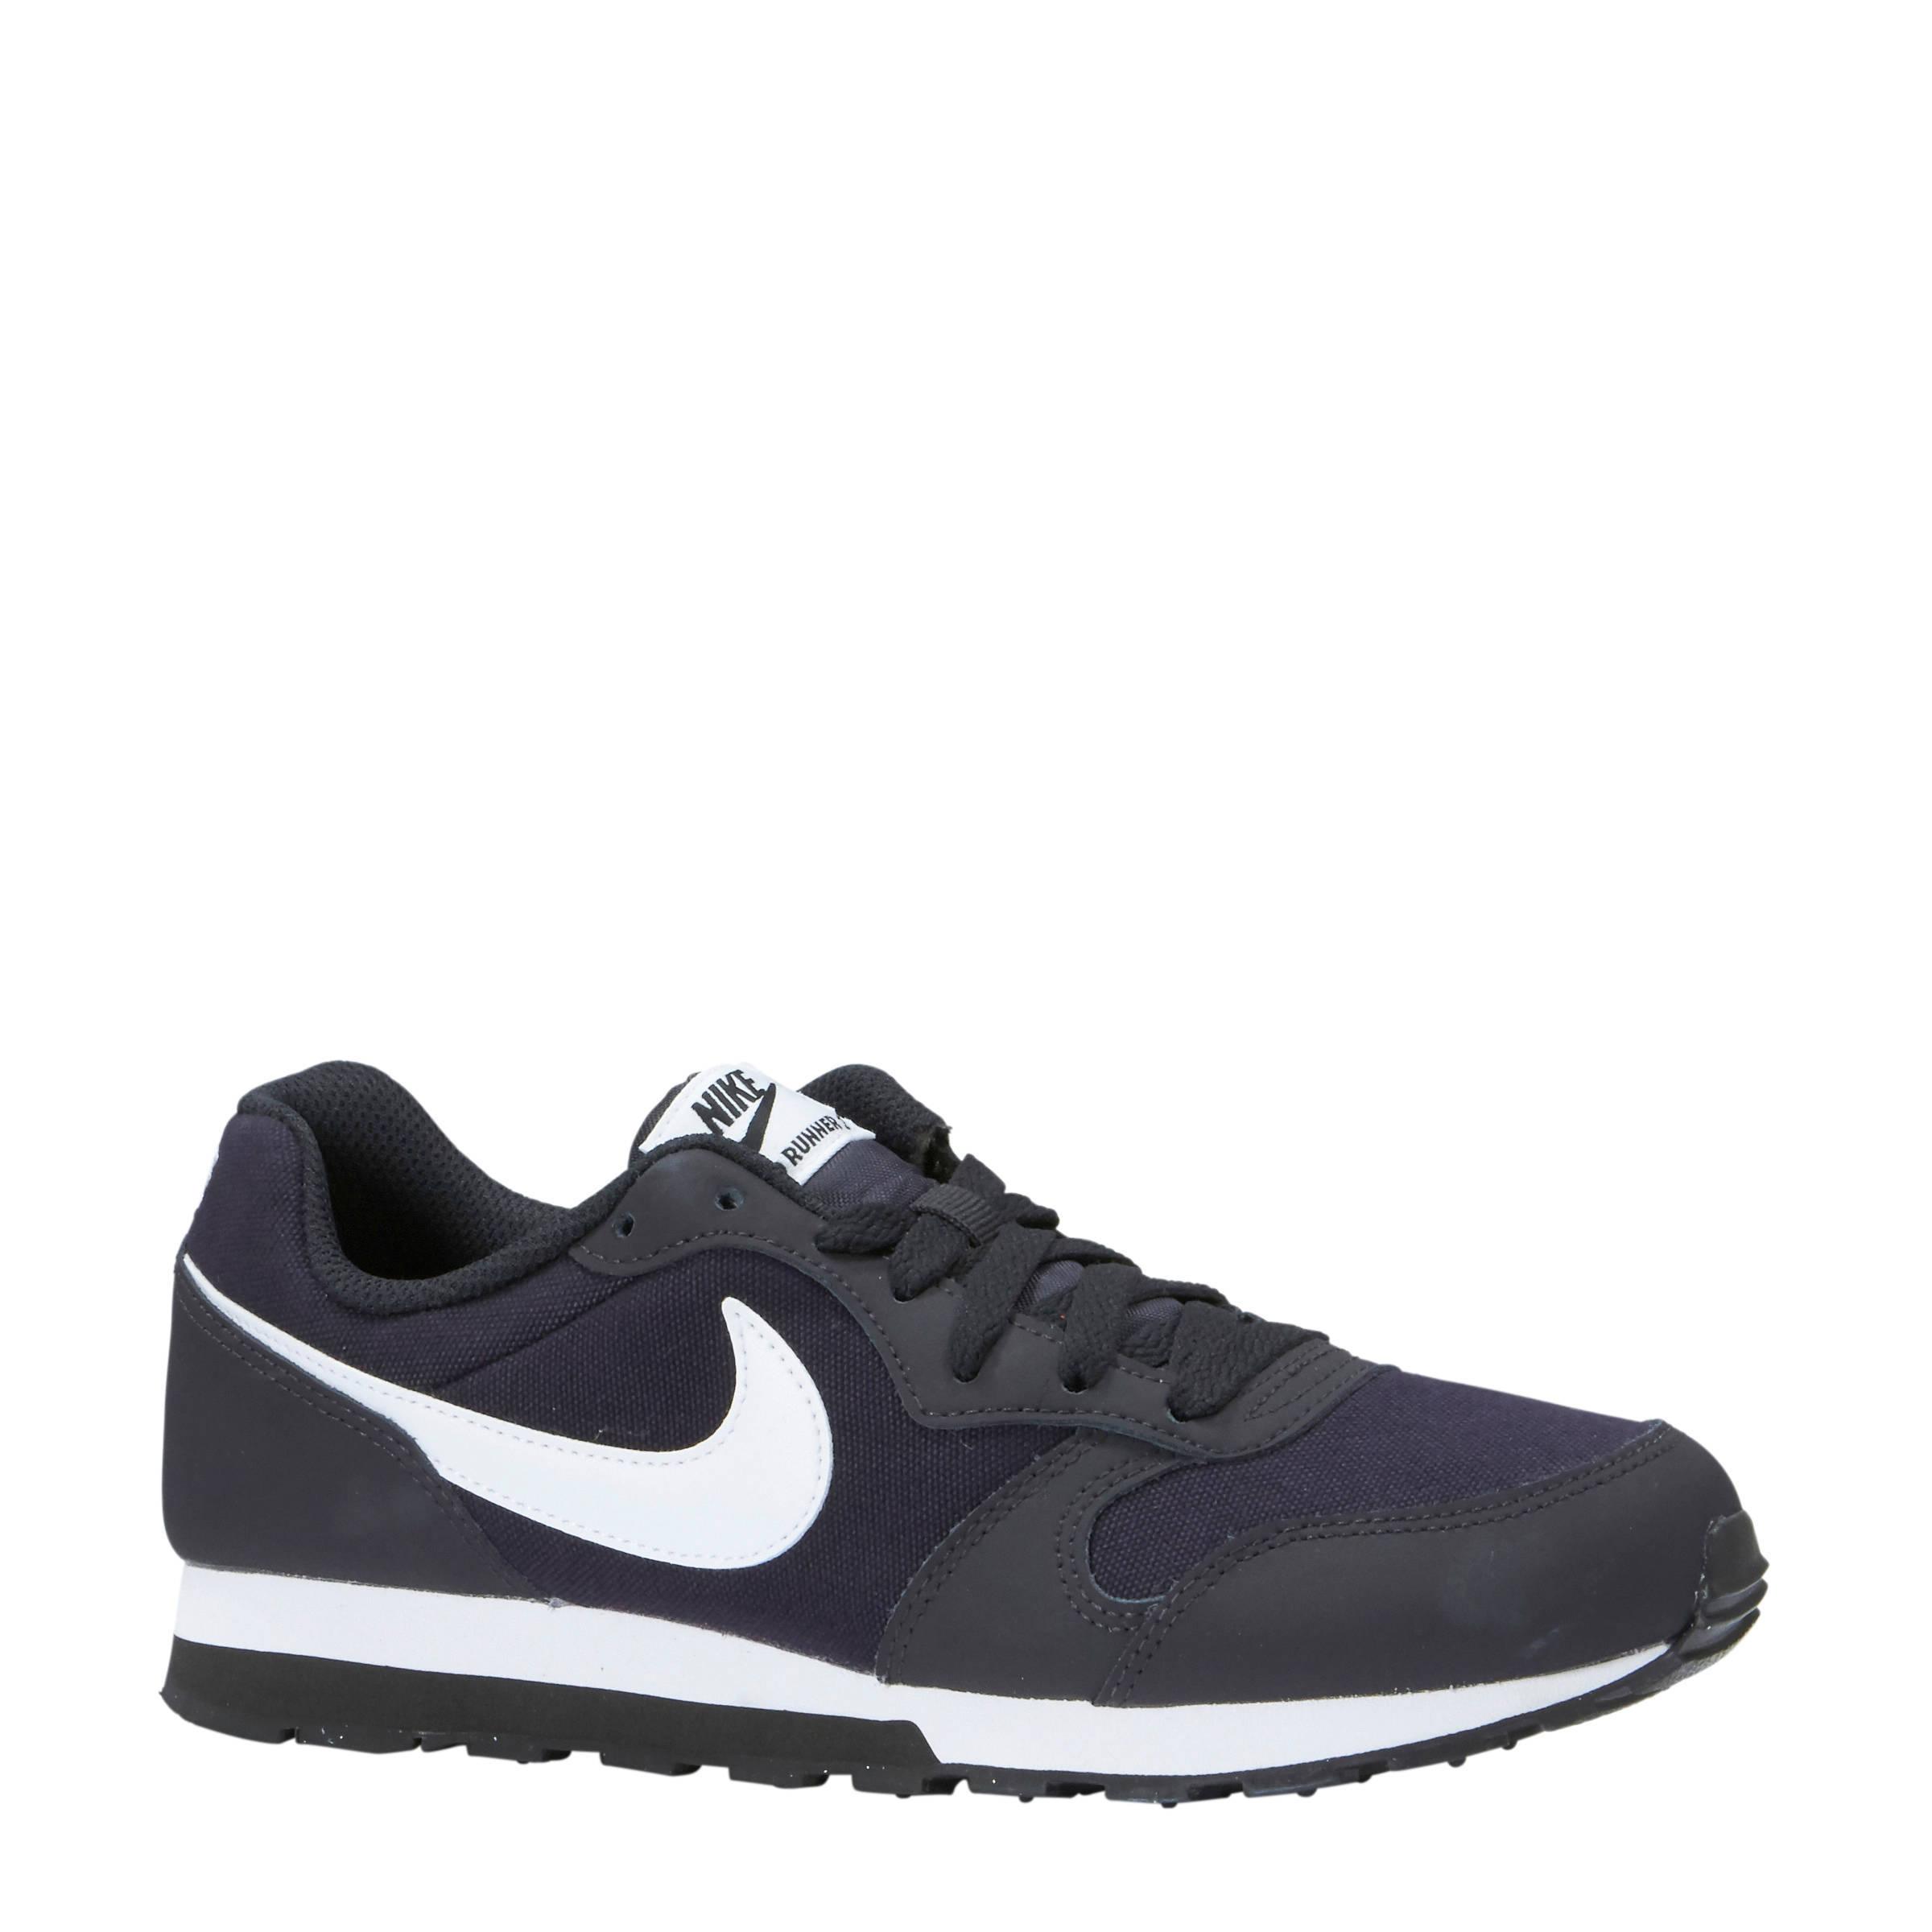 1dfec2920a1 Nike MD Runner 2 (GS) sneakers zwart/marine | wehkamp